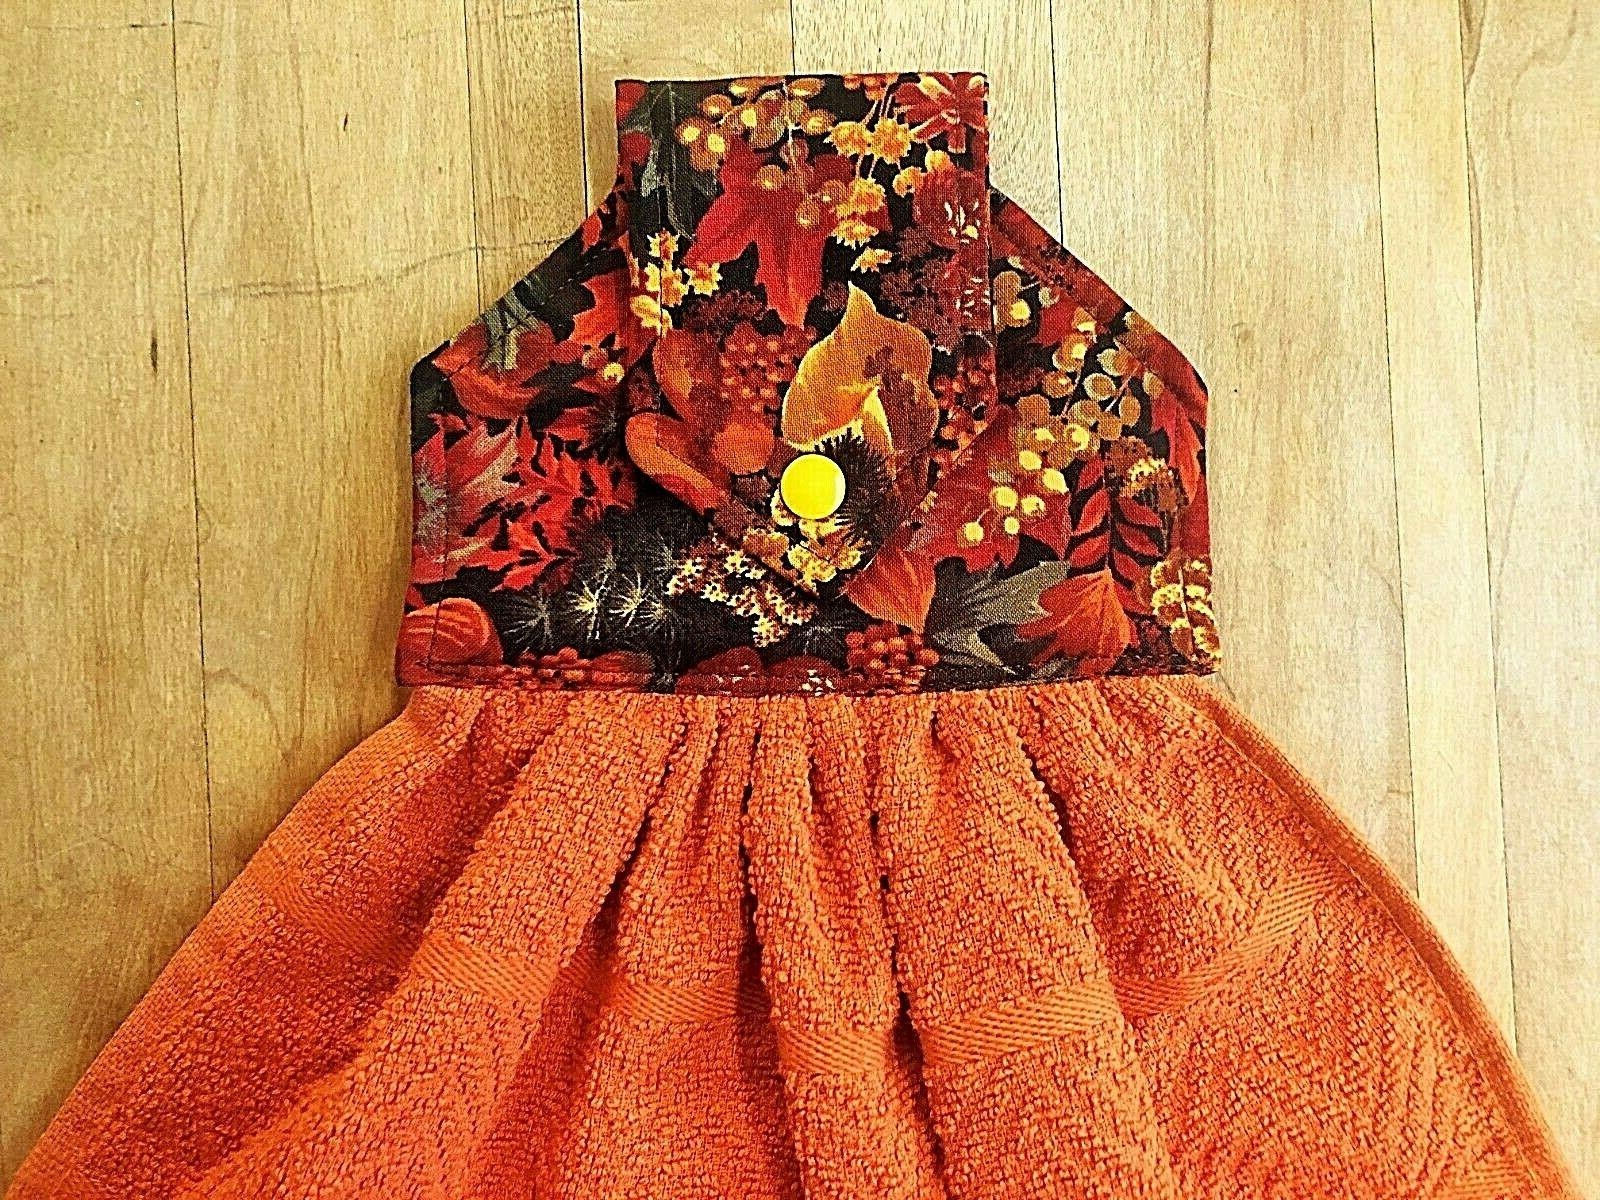 Harvest Fall Hanging Orange Towels,